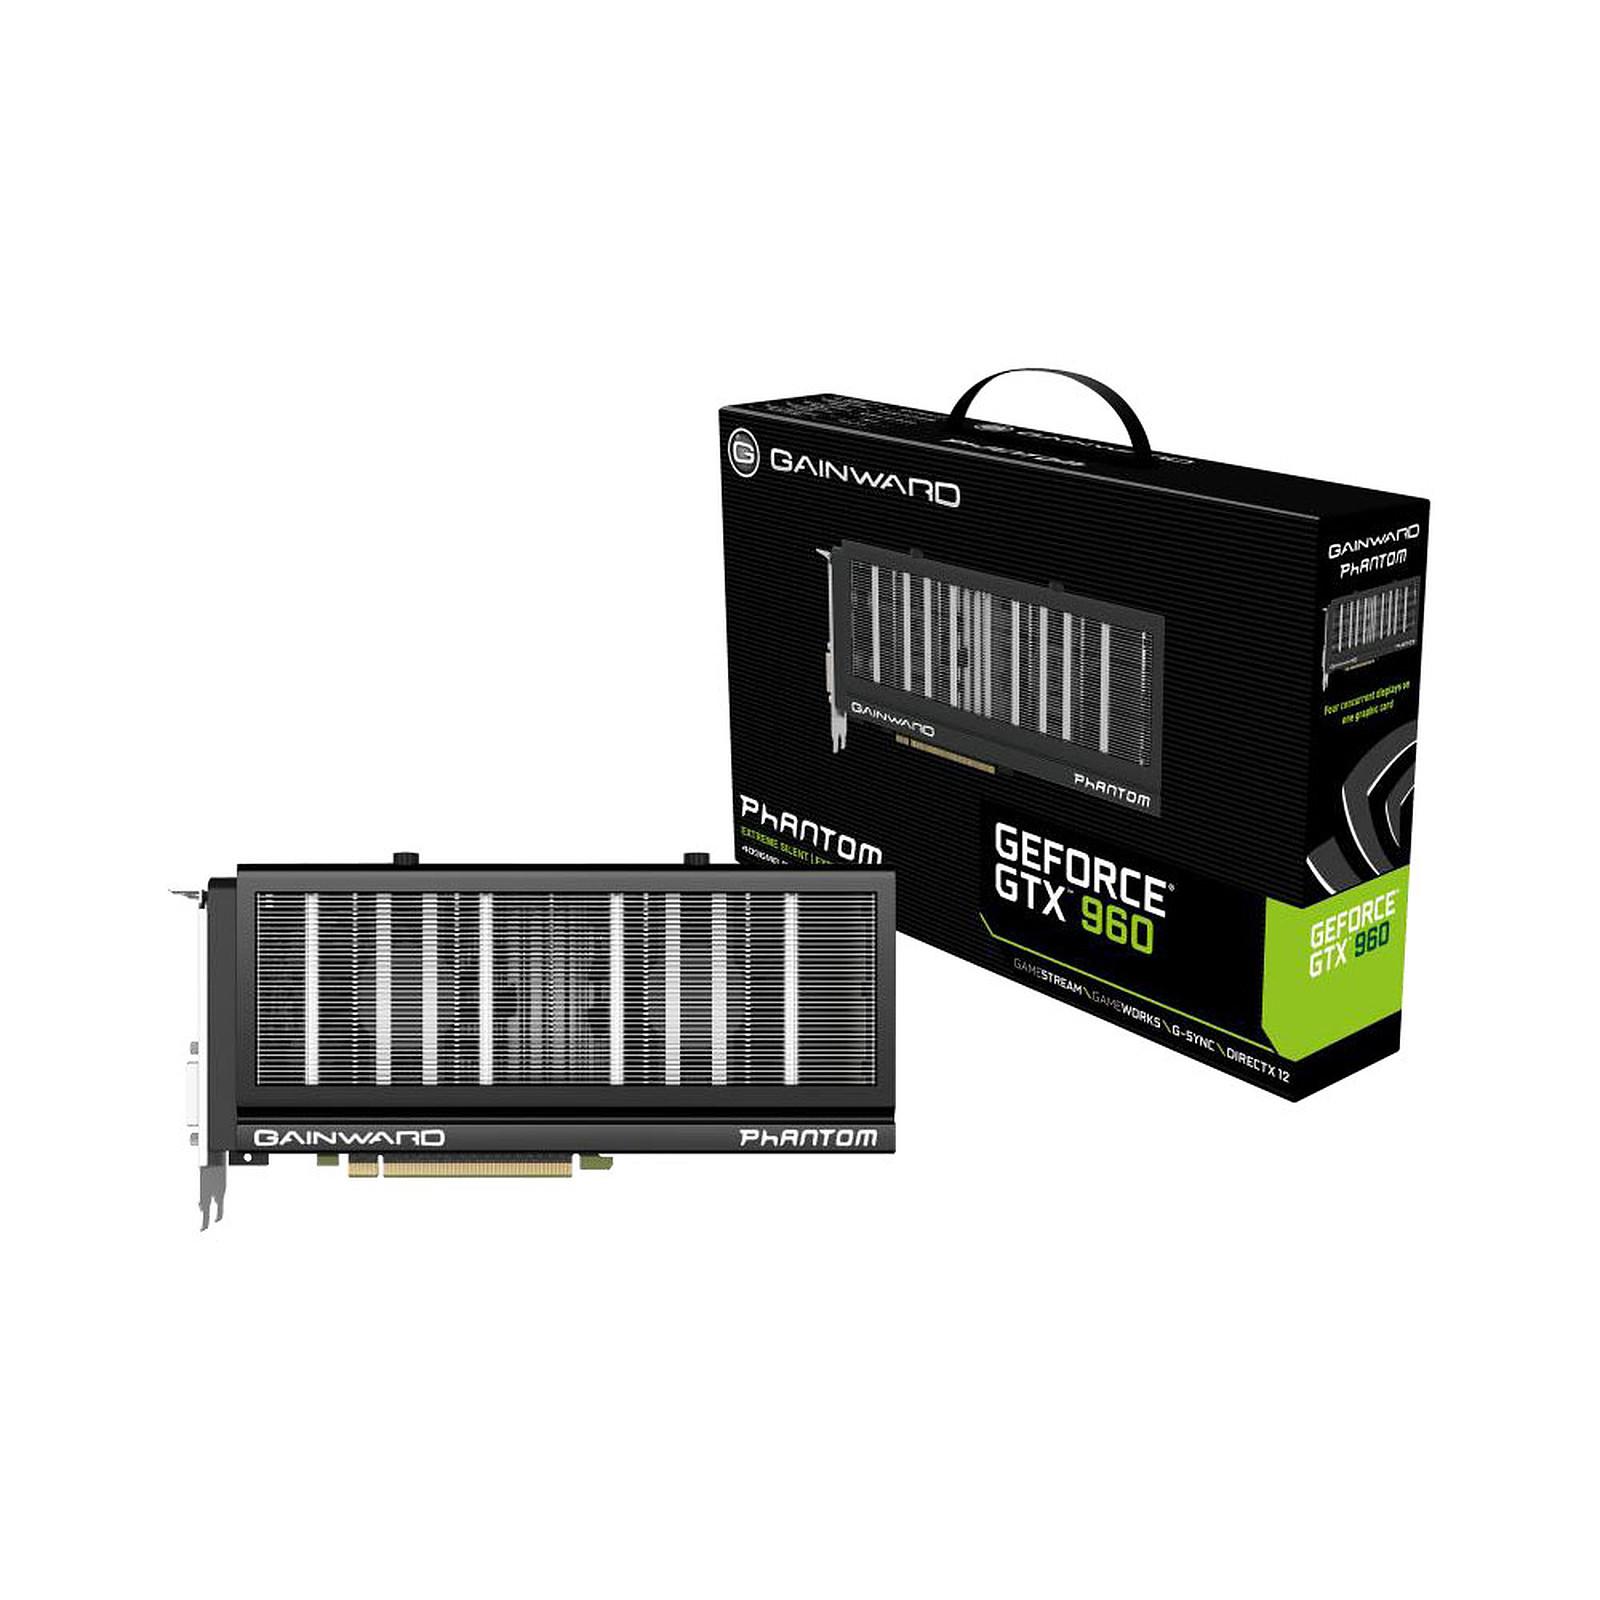 Gainward GeForce GTX 960 Phantom 4096 MB